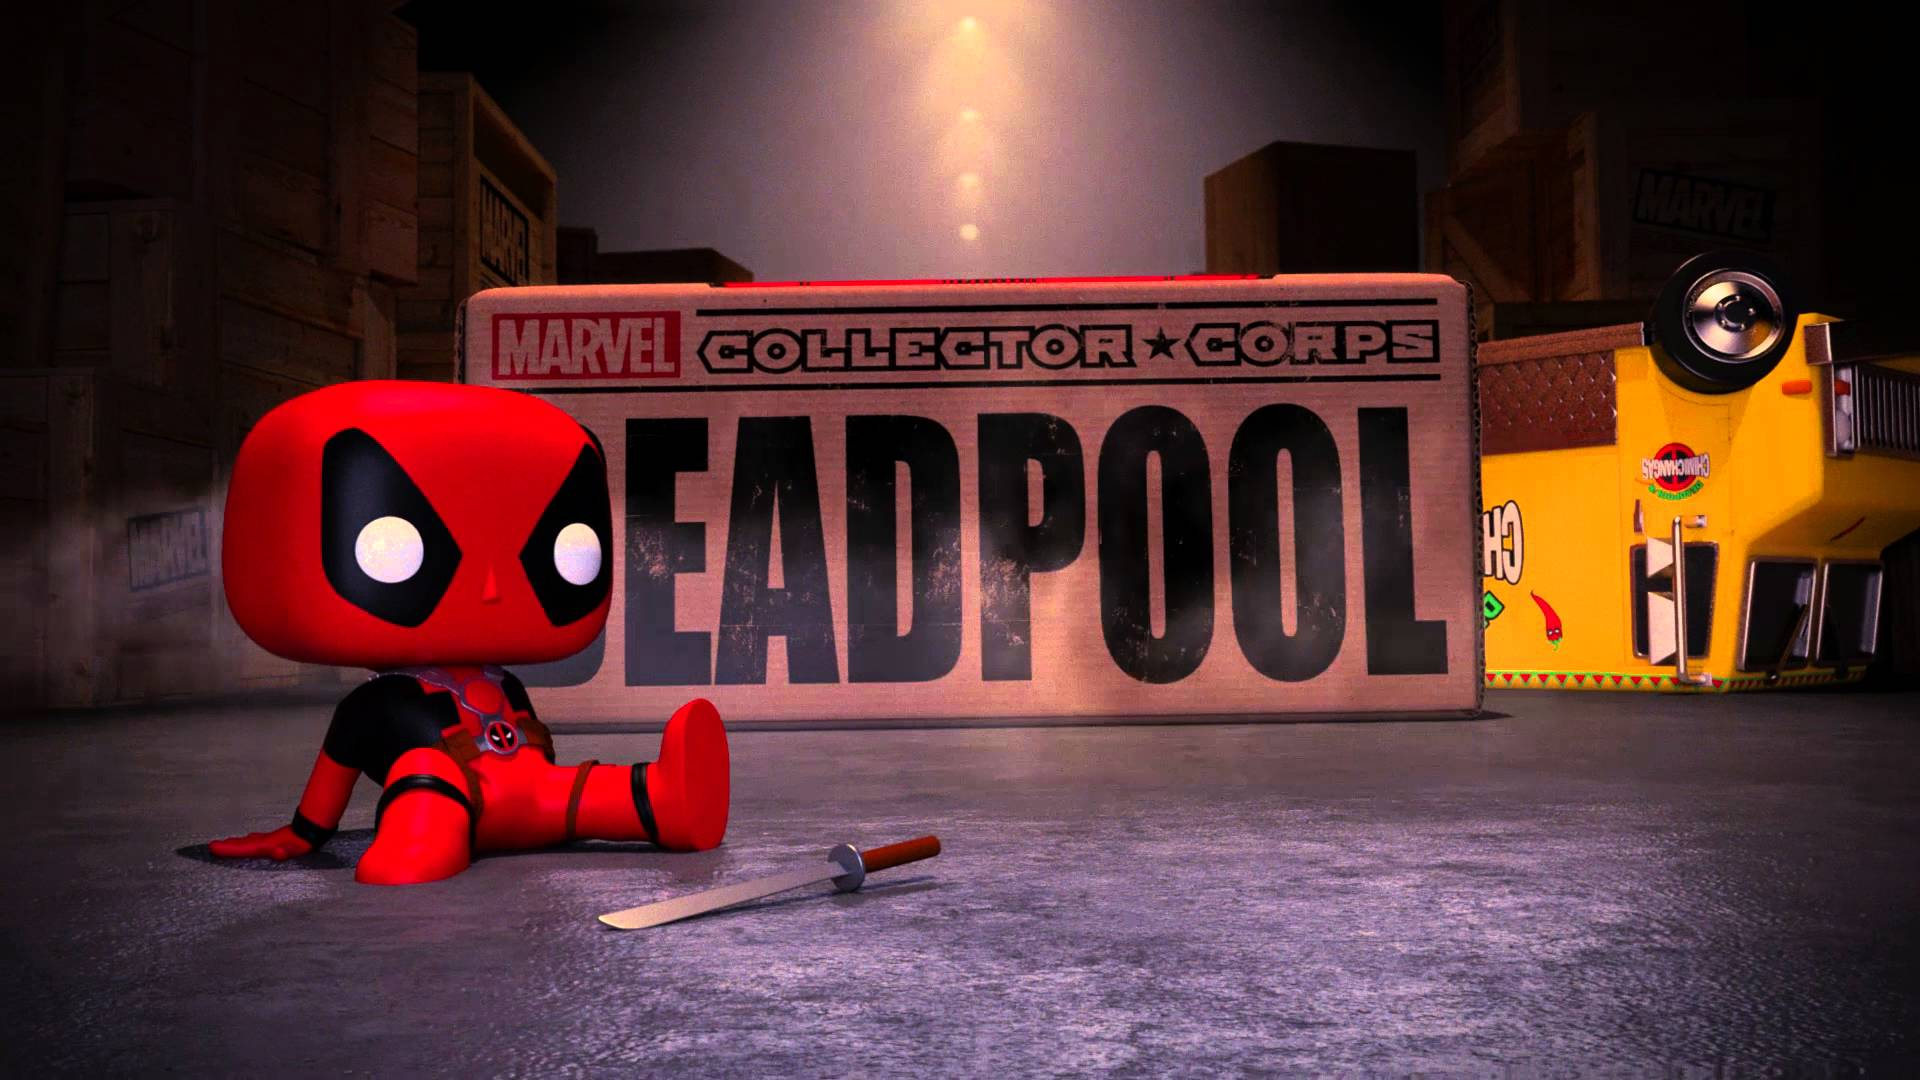 Deadpool Collector corps